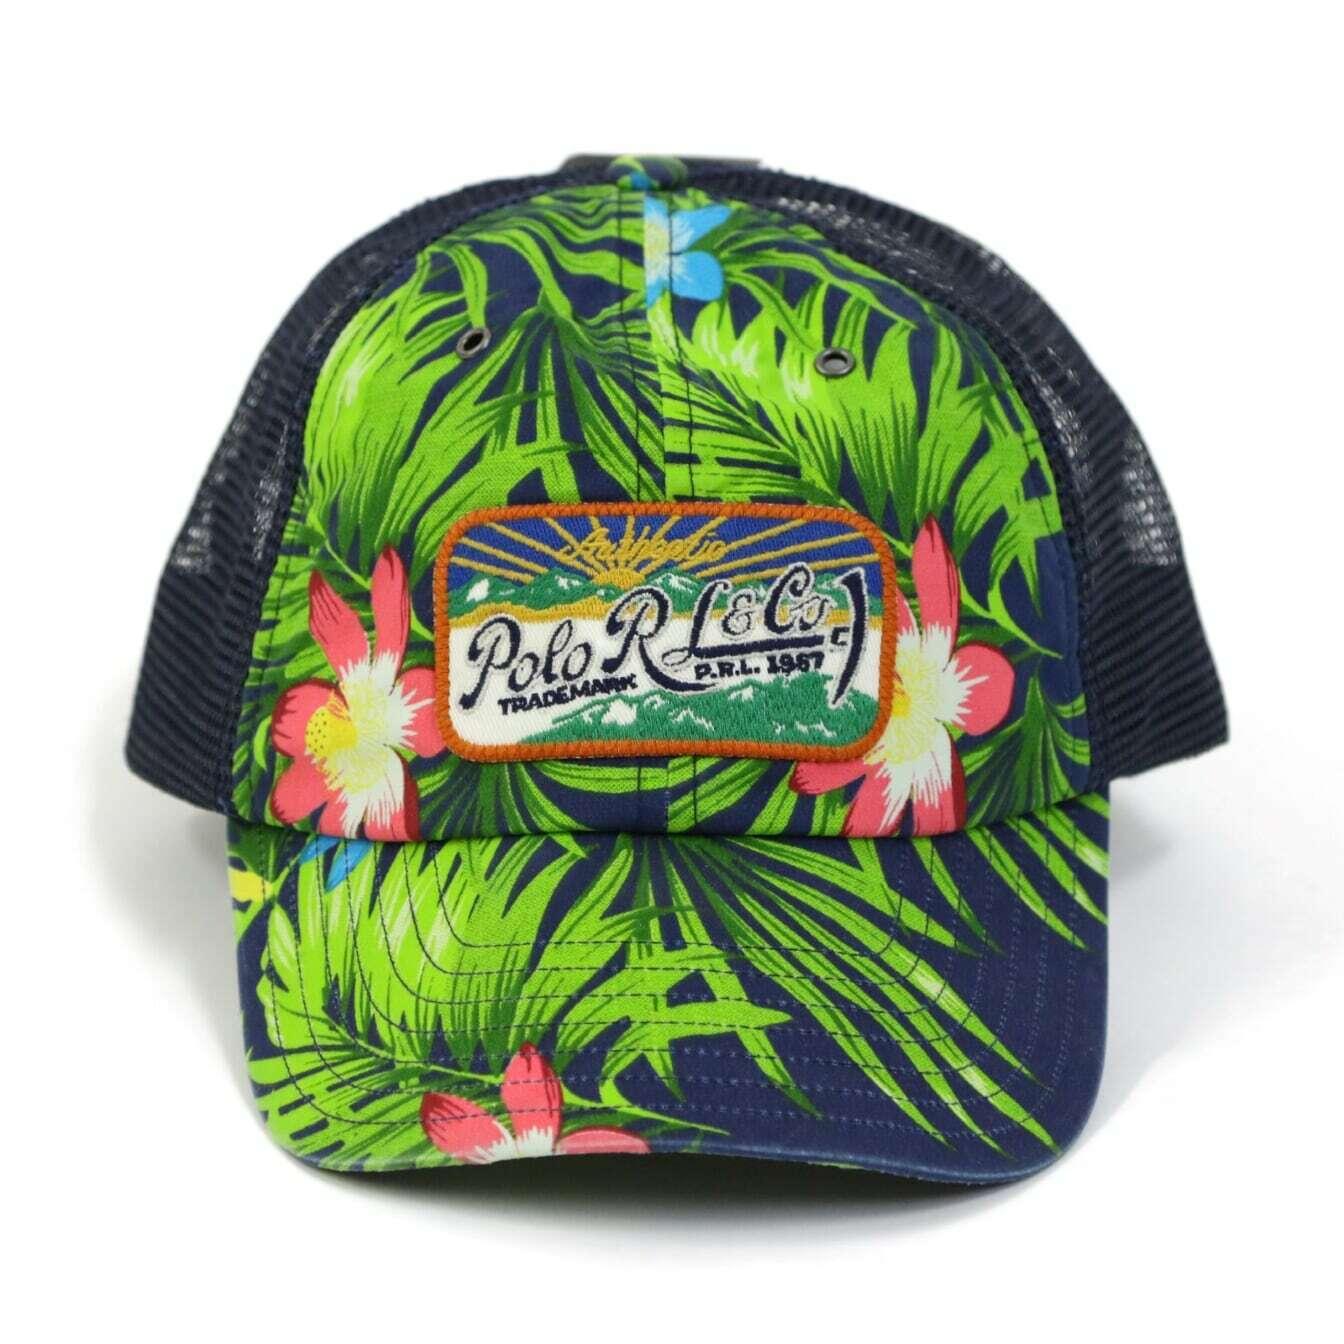 Polo Ralph Lauren Aloha Floral Mesh Trucker Baseball Hat Cap  2 colors